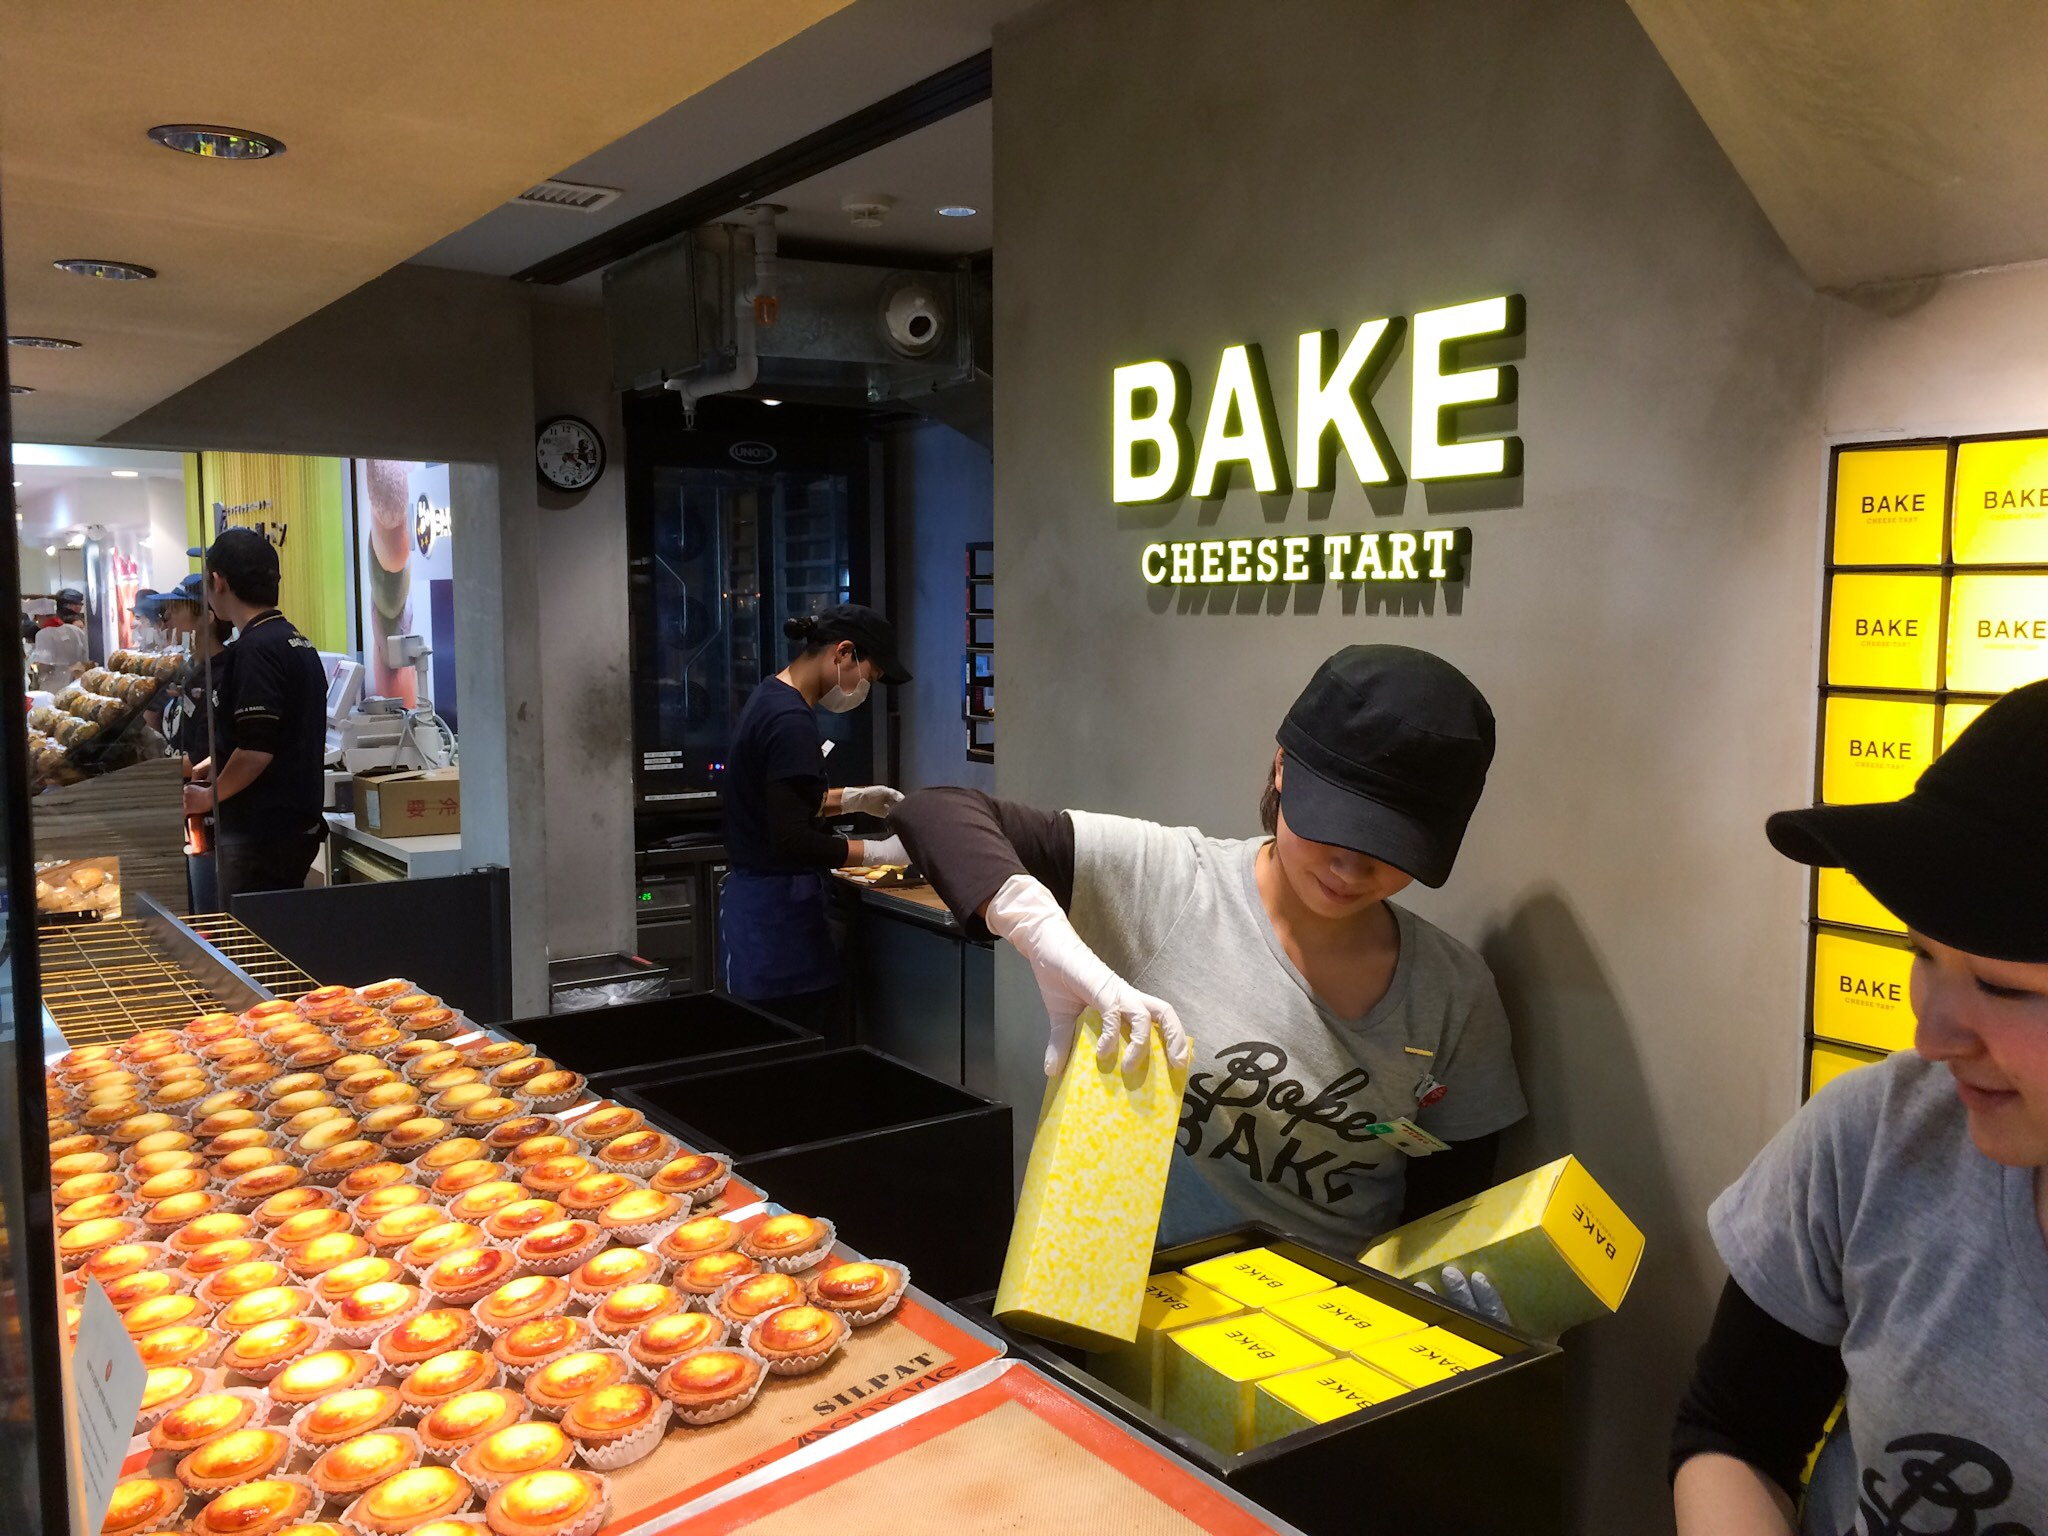 Resultado de imagem para bake cheese tart